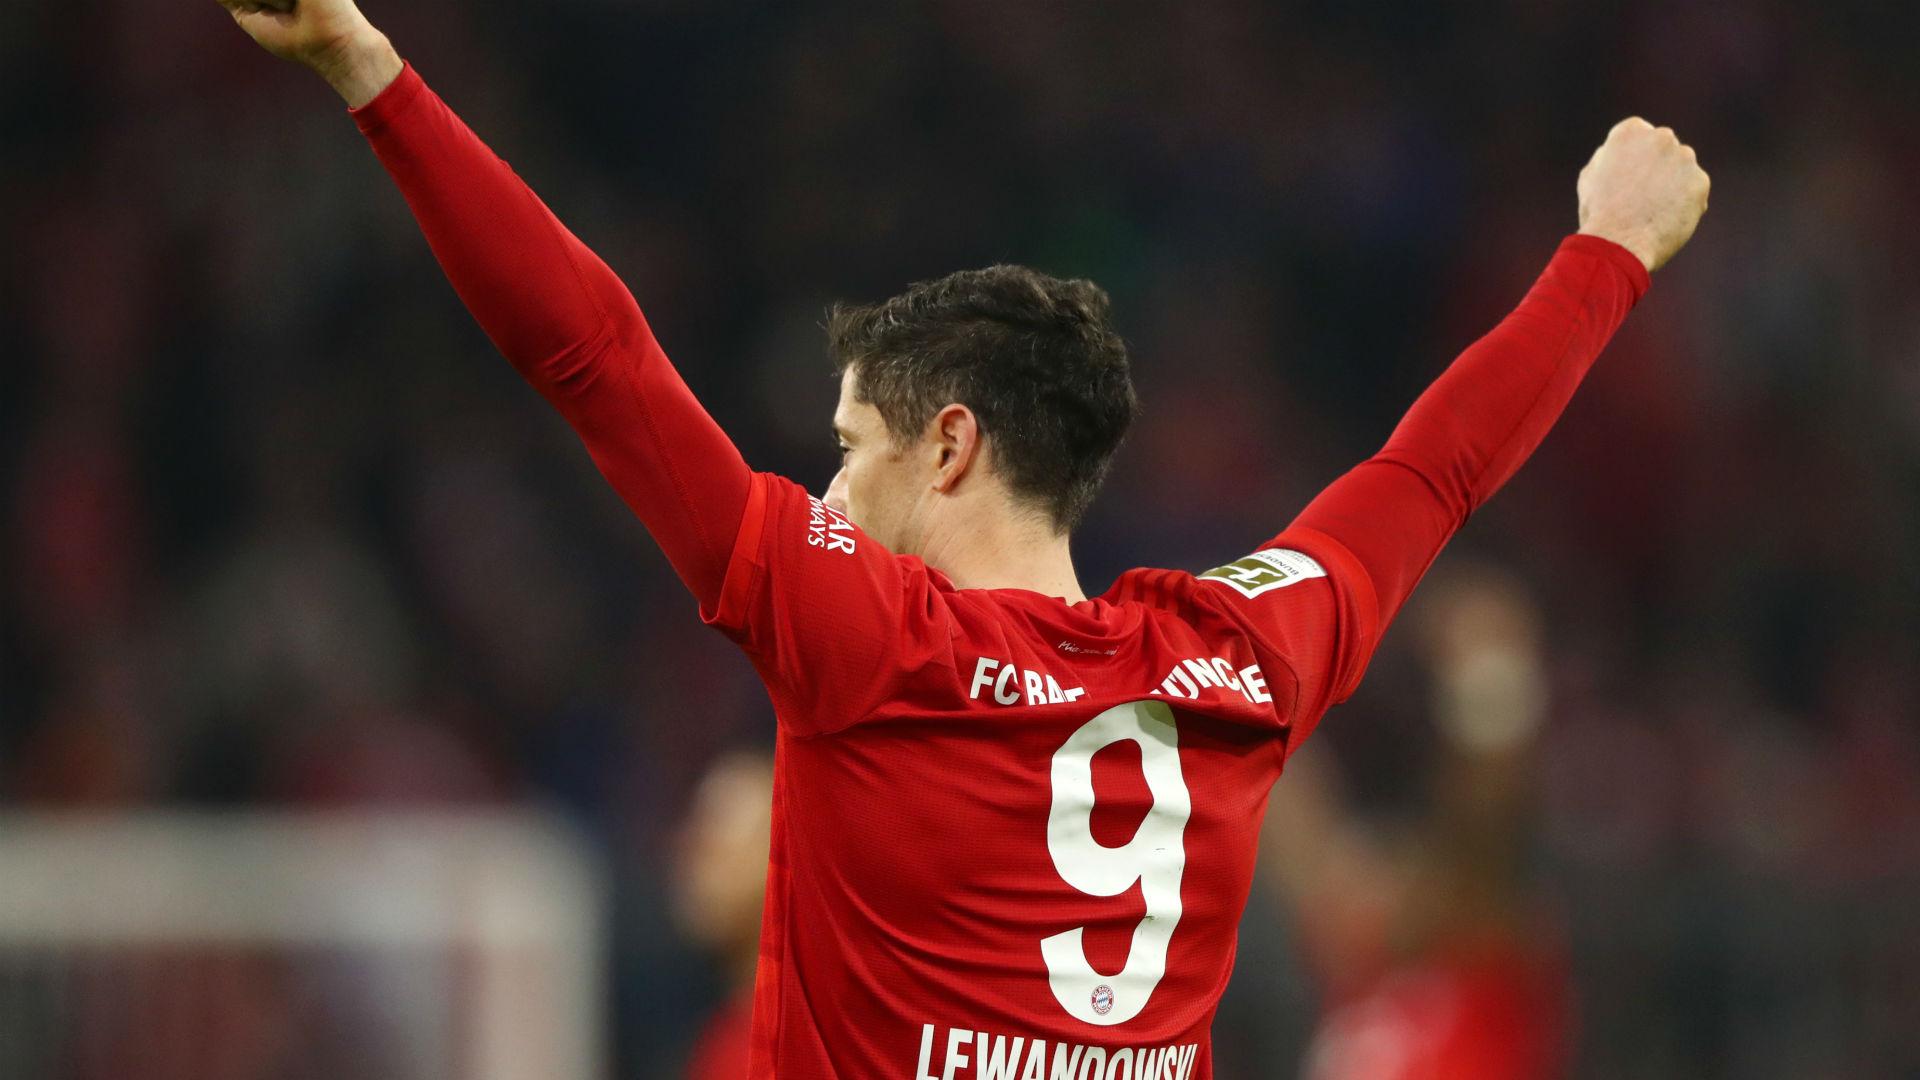 Brutal Lewandowski reopens Dortmund scars to lift Bayern crisis